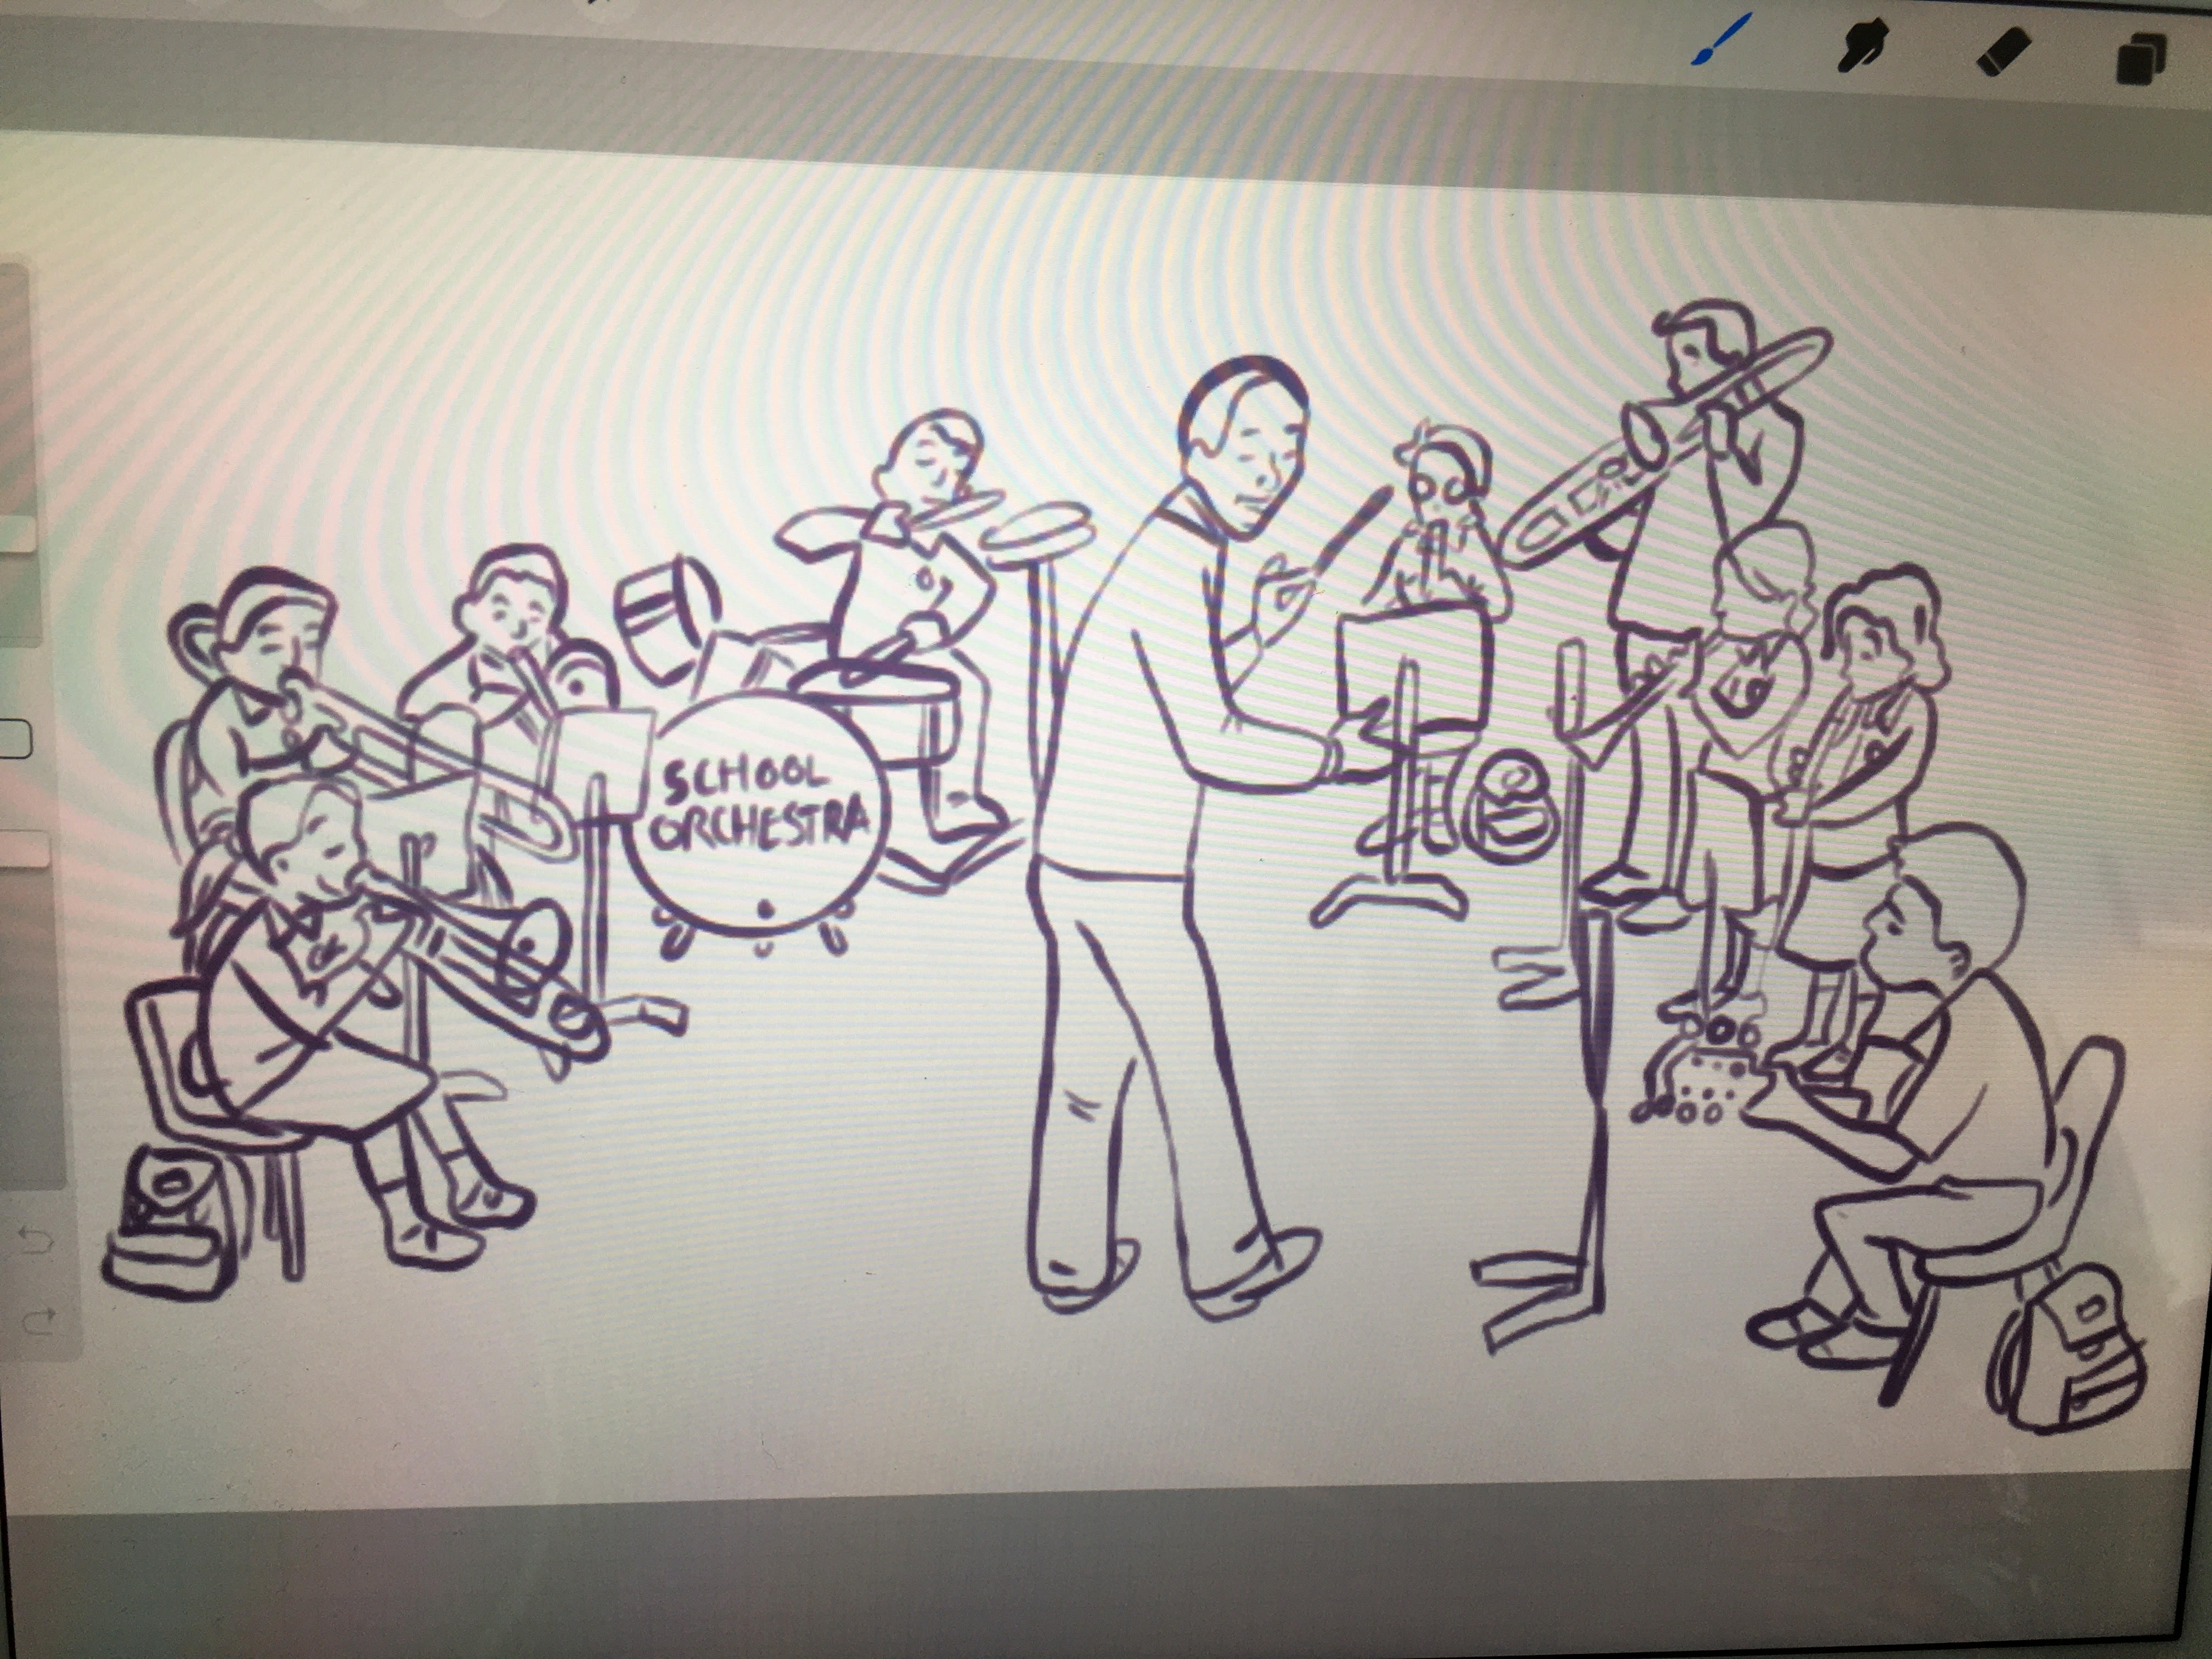 08/06/20 - Orchestra